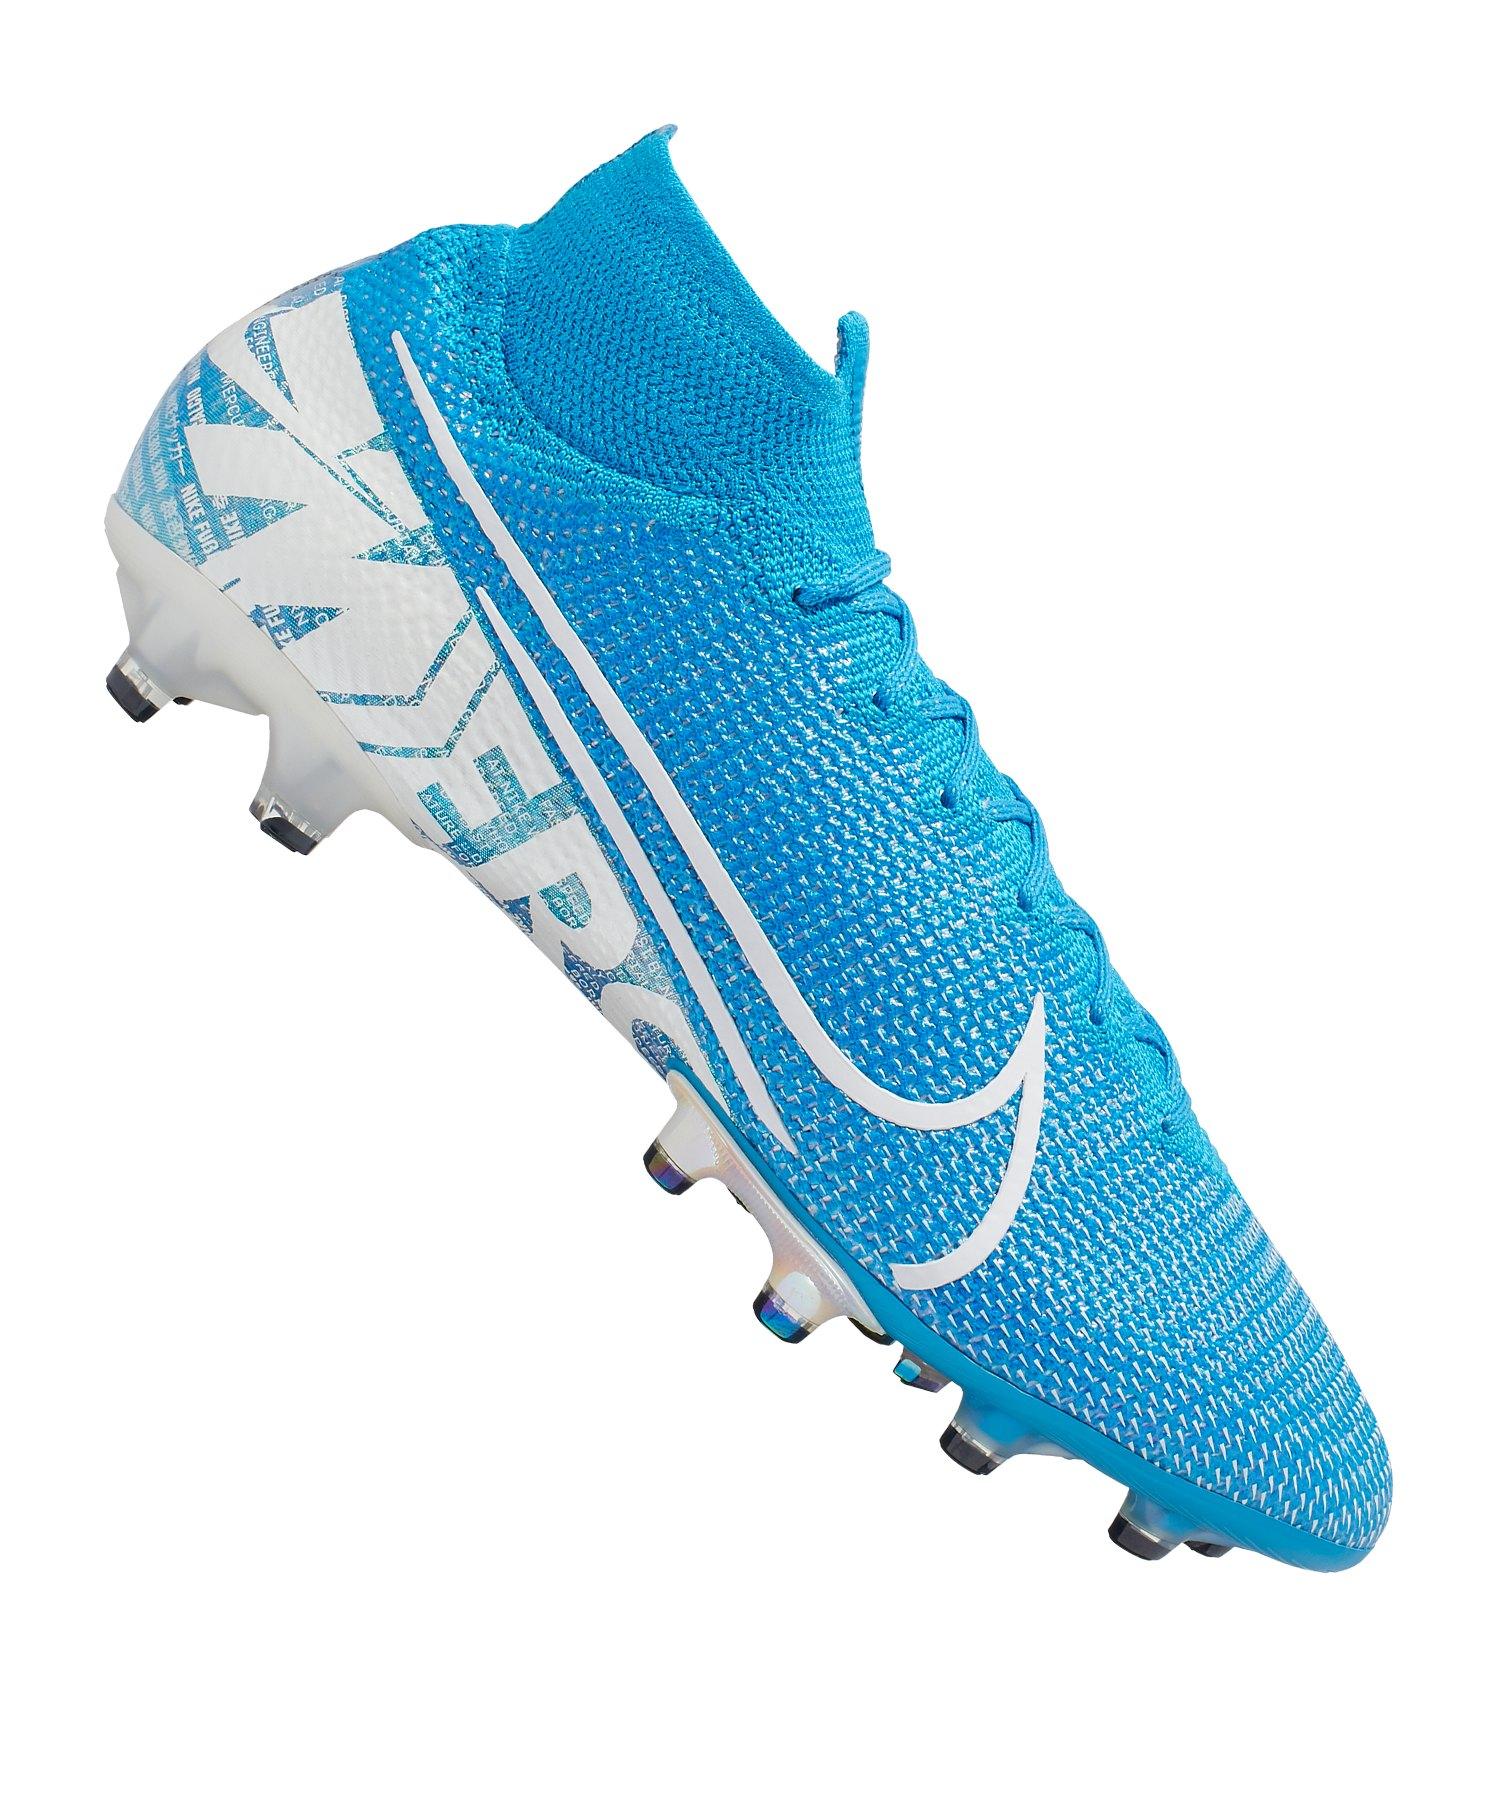 Nike Mercurial Superfly VII Elite AG-Pro Blau F414 - blau